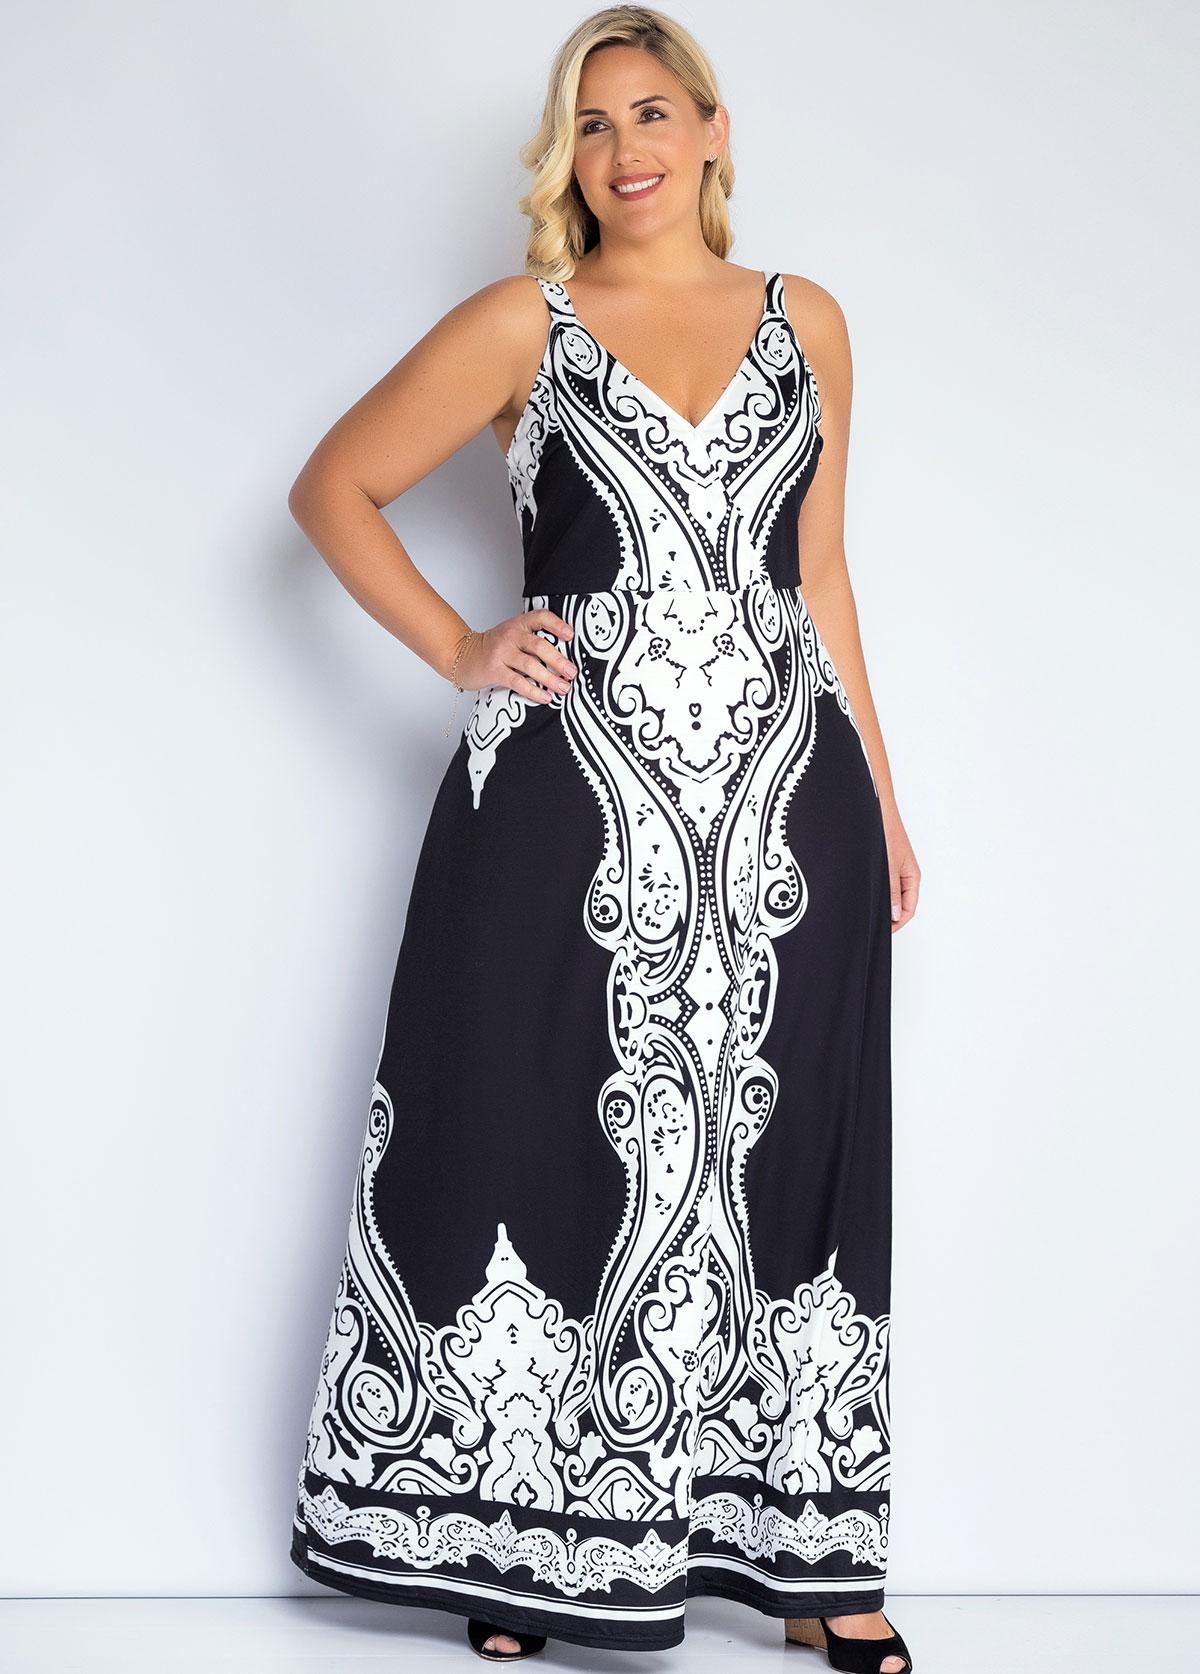 ROTITA Spaghetti Strap Plus Size Tribal Print Dress